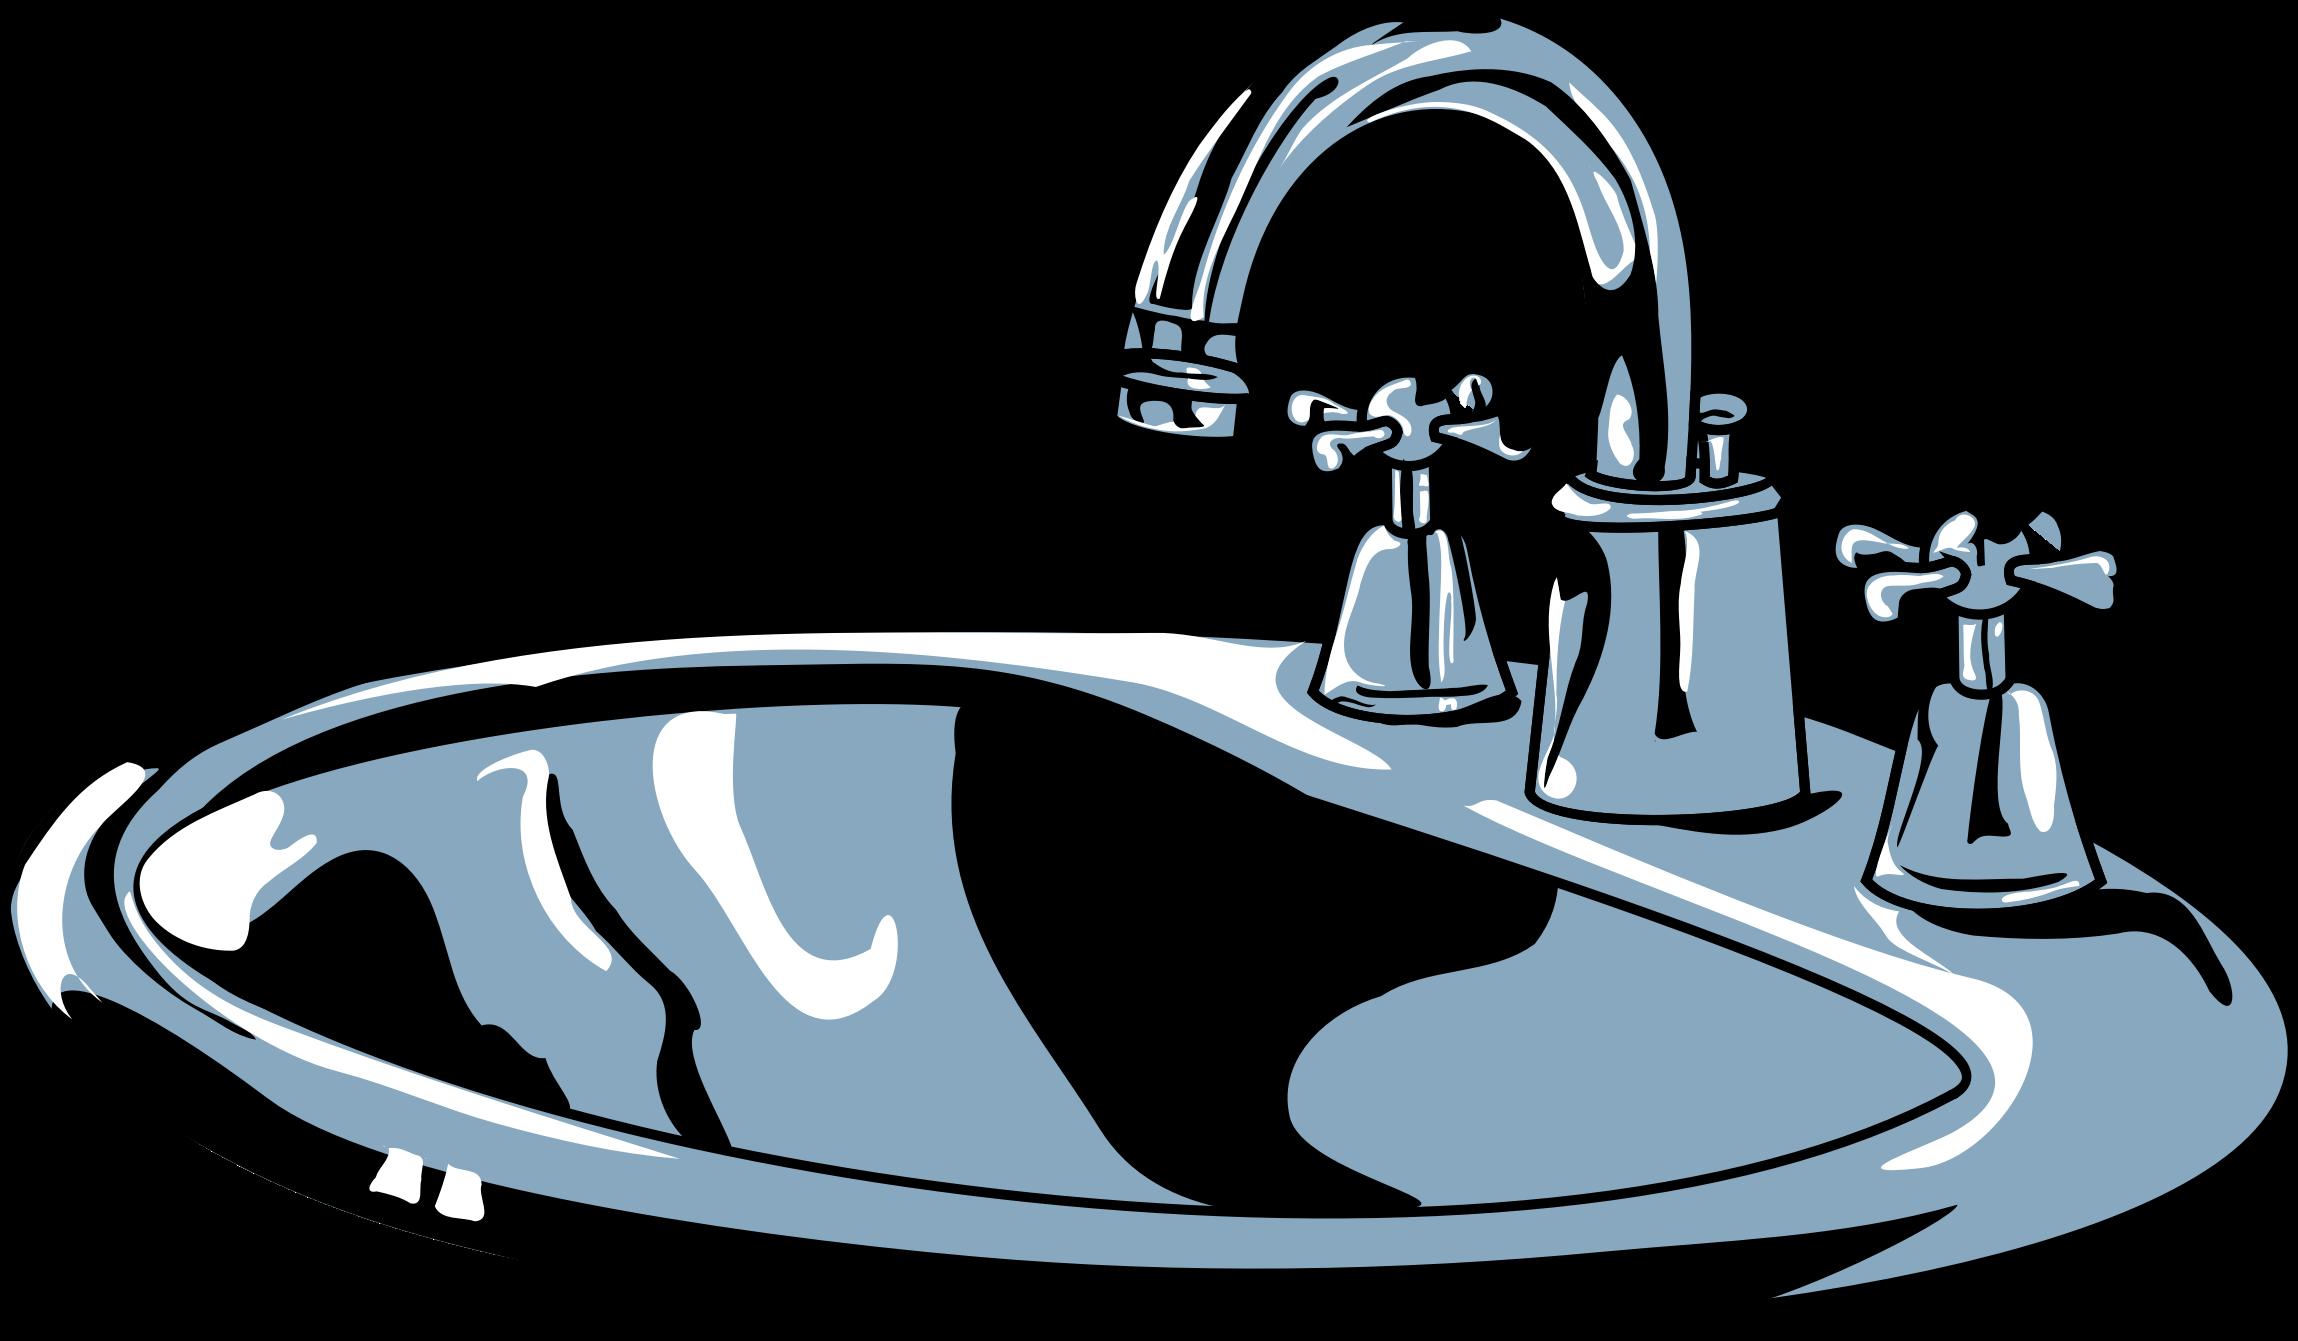 Bath Vanity Clipart - Clipart Suggest